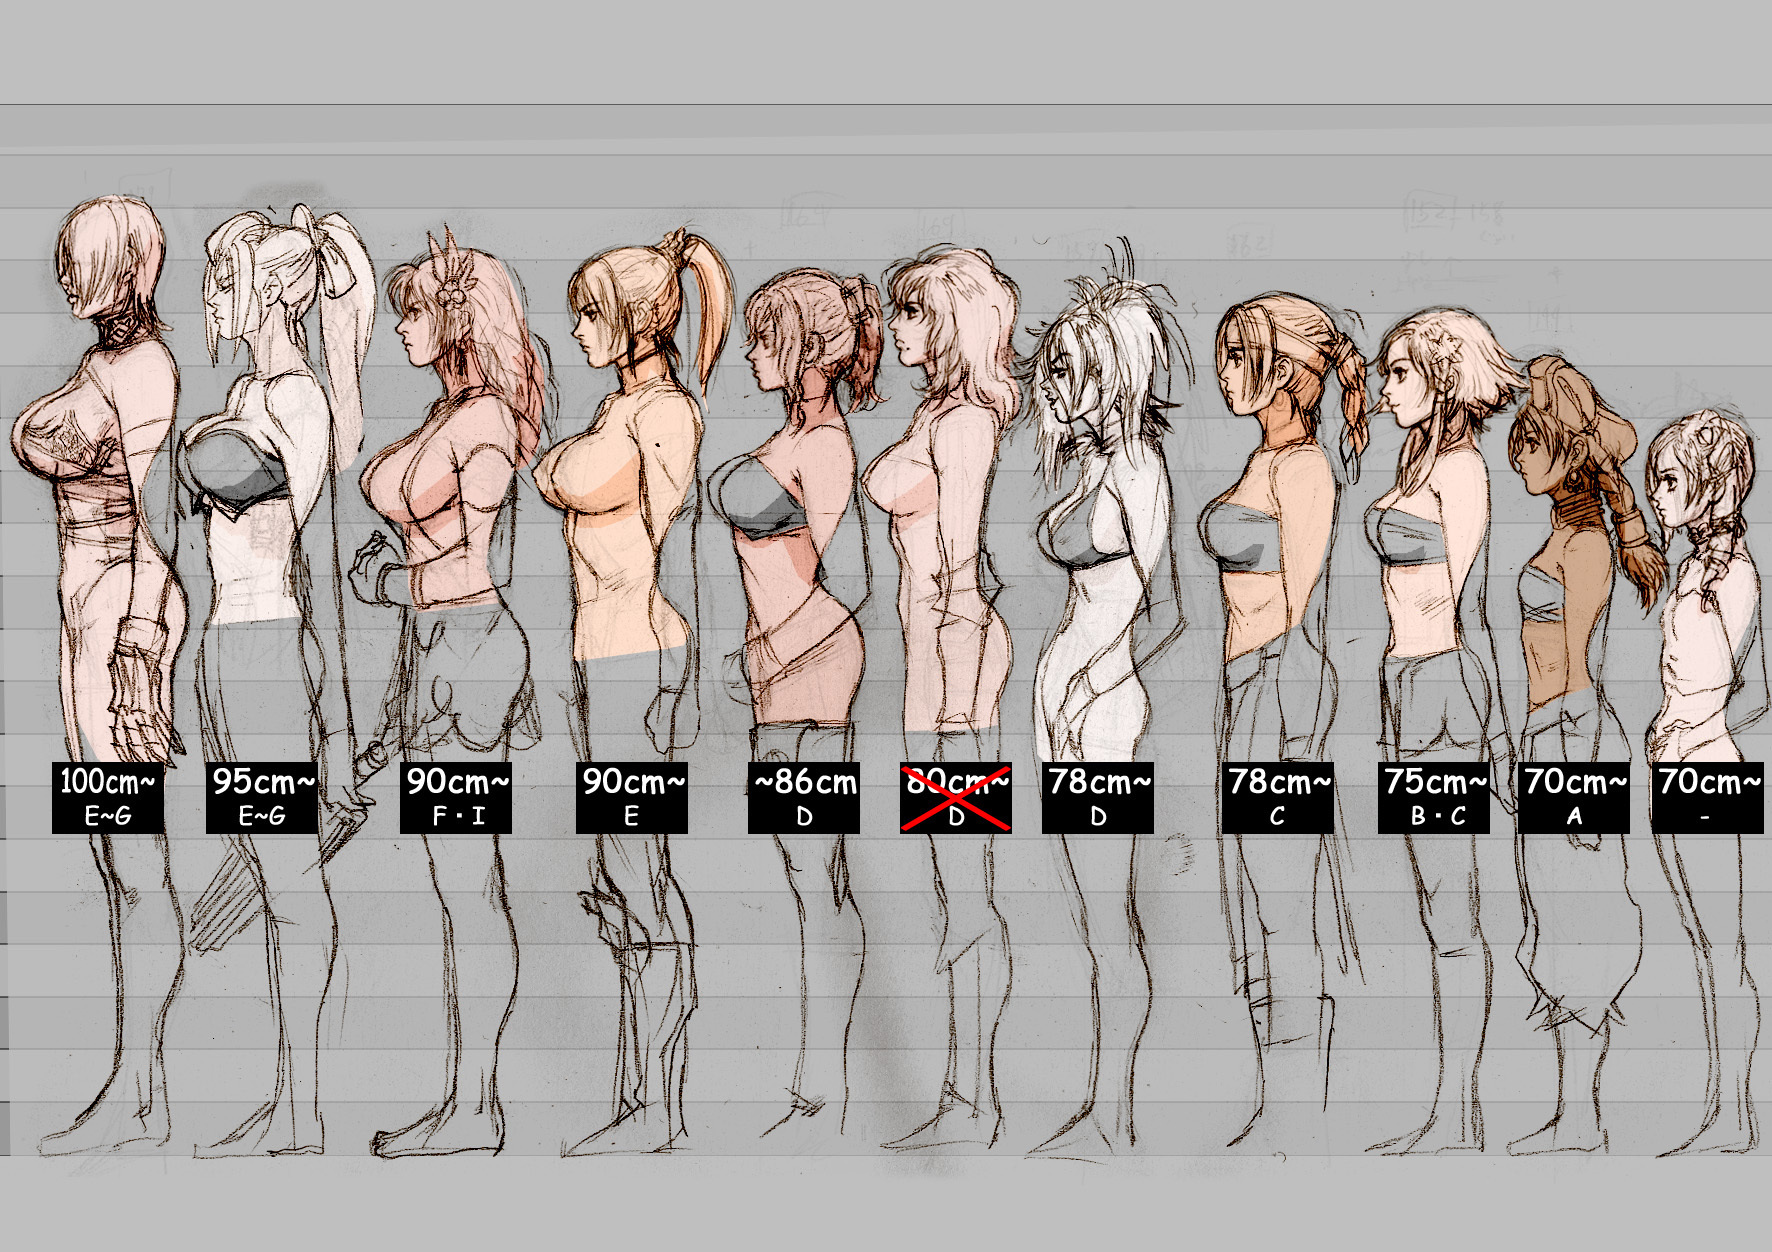 SoulCalibur V Concept Art